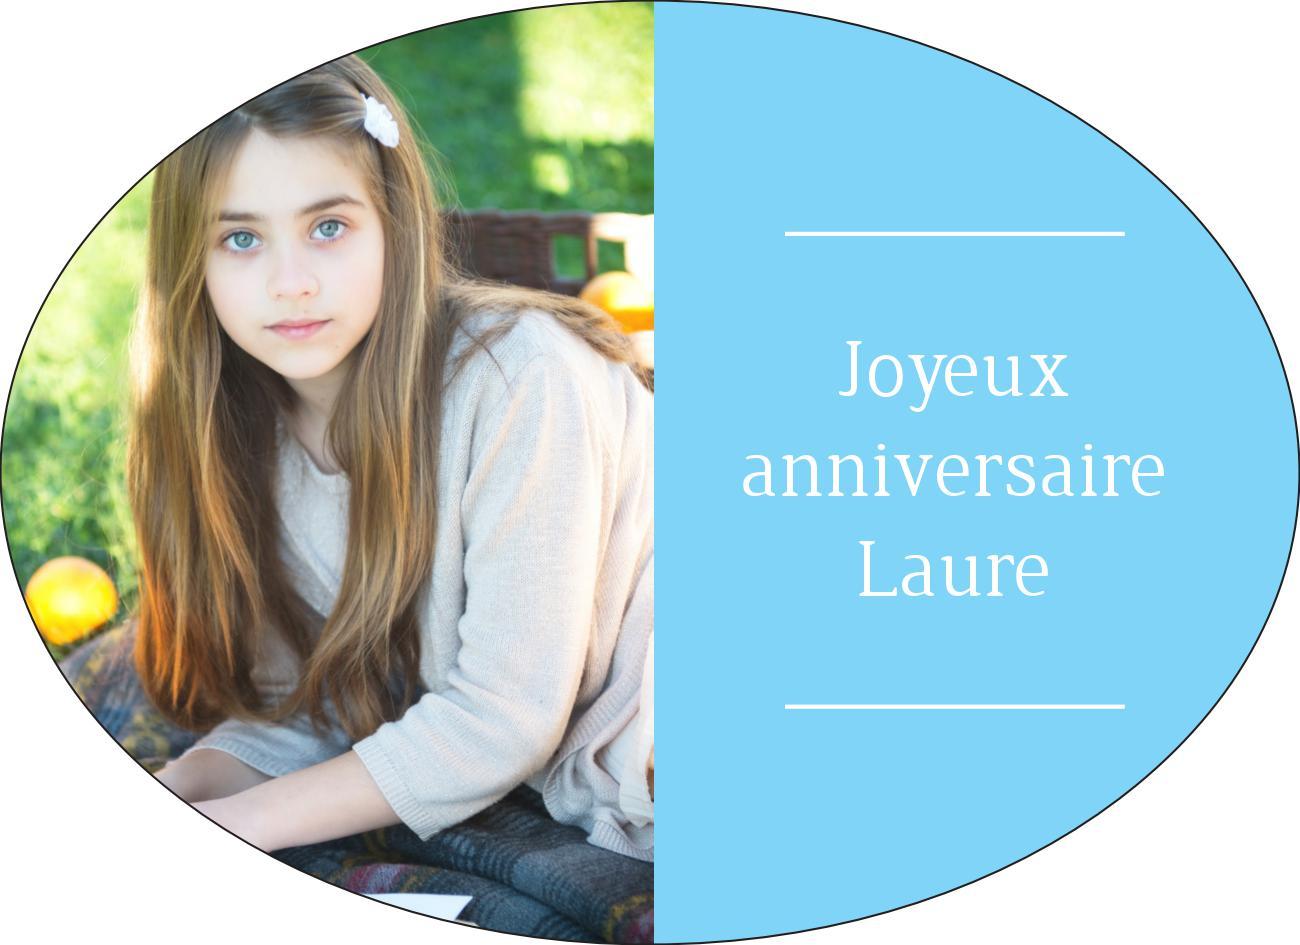 birthday-children-laure_has-image